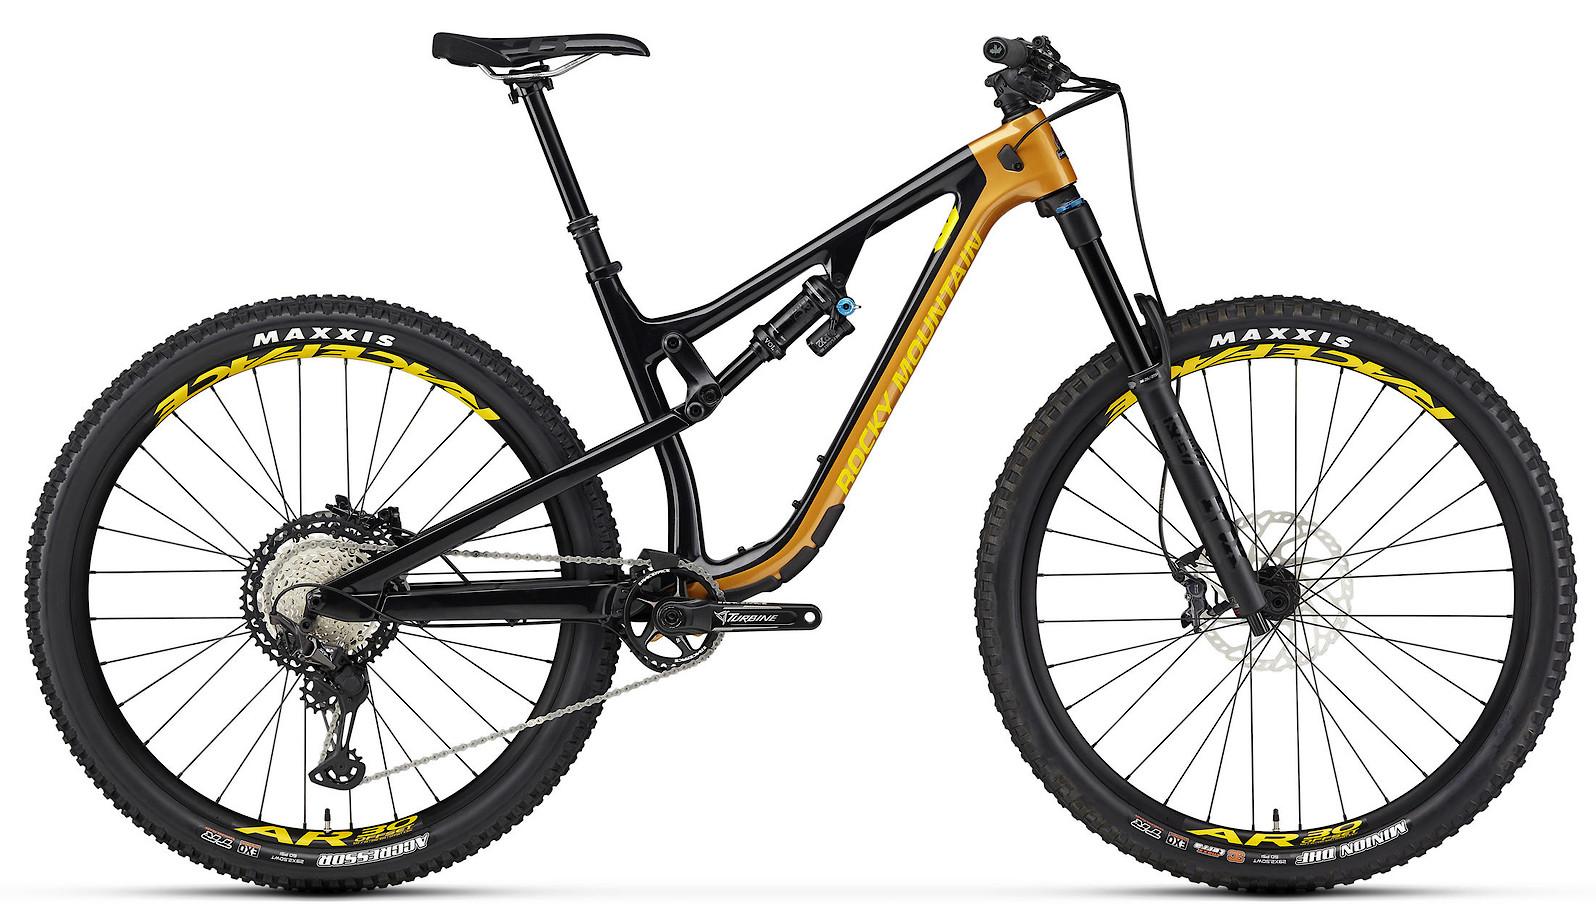 2020 Rocky Mountain Instinct Carbon 70 BC Edition Black Orange and Yellow